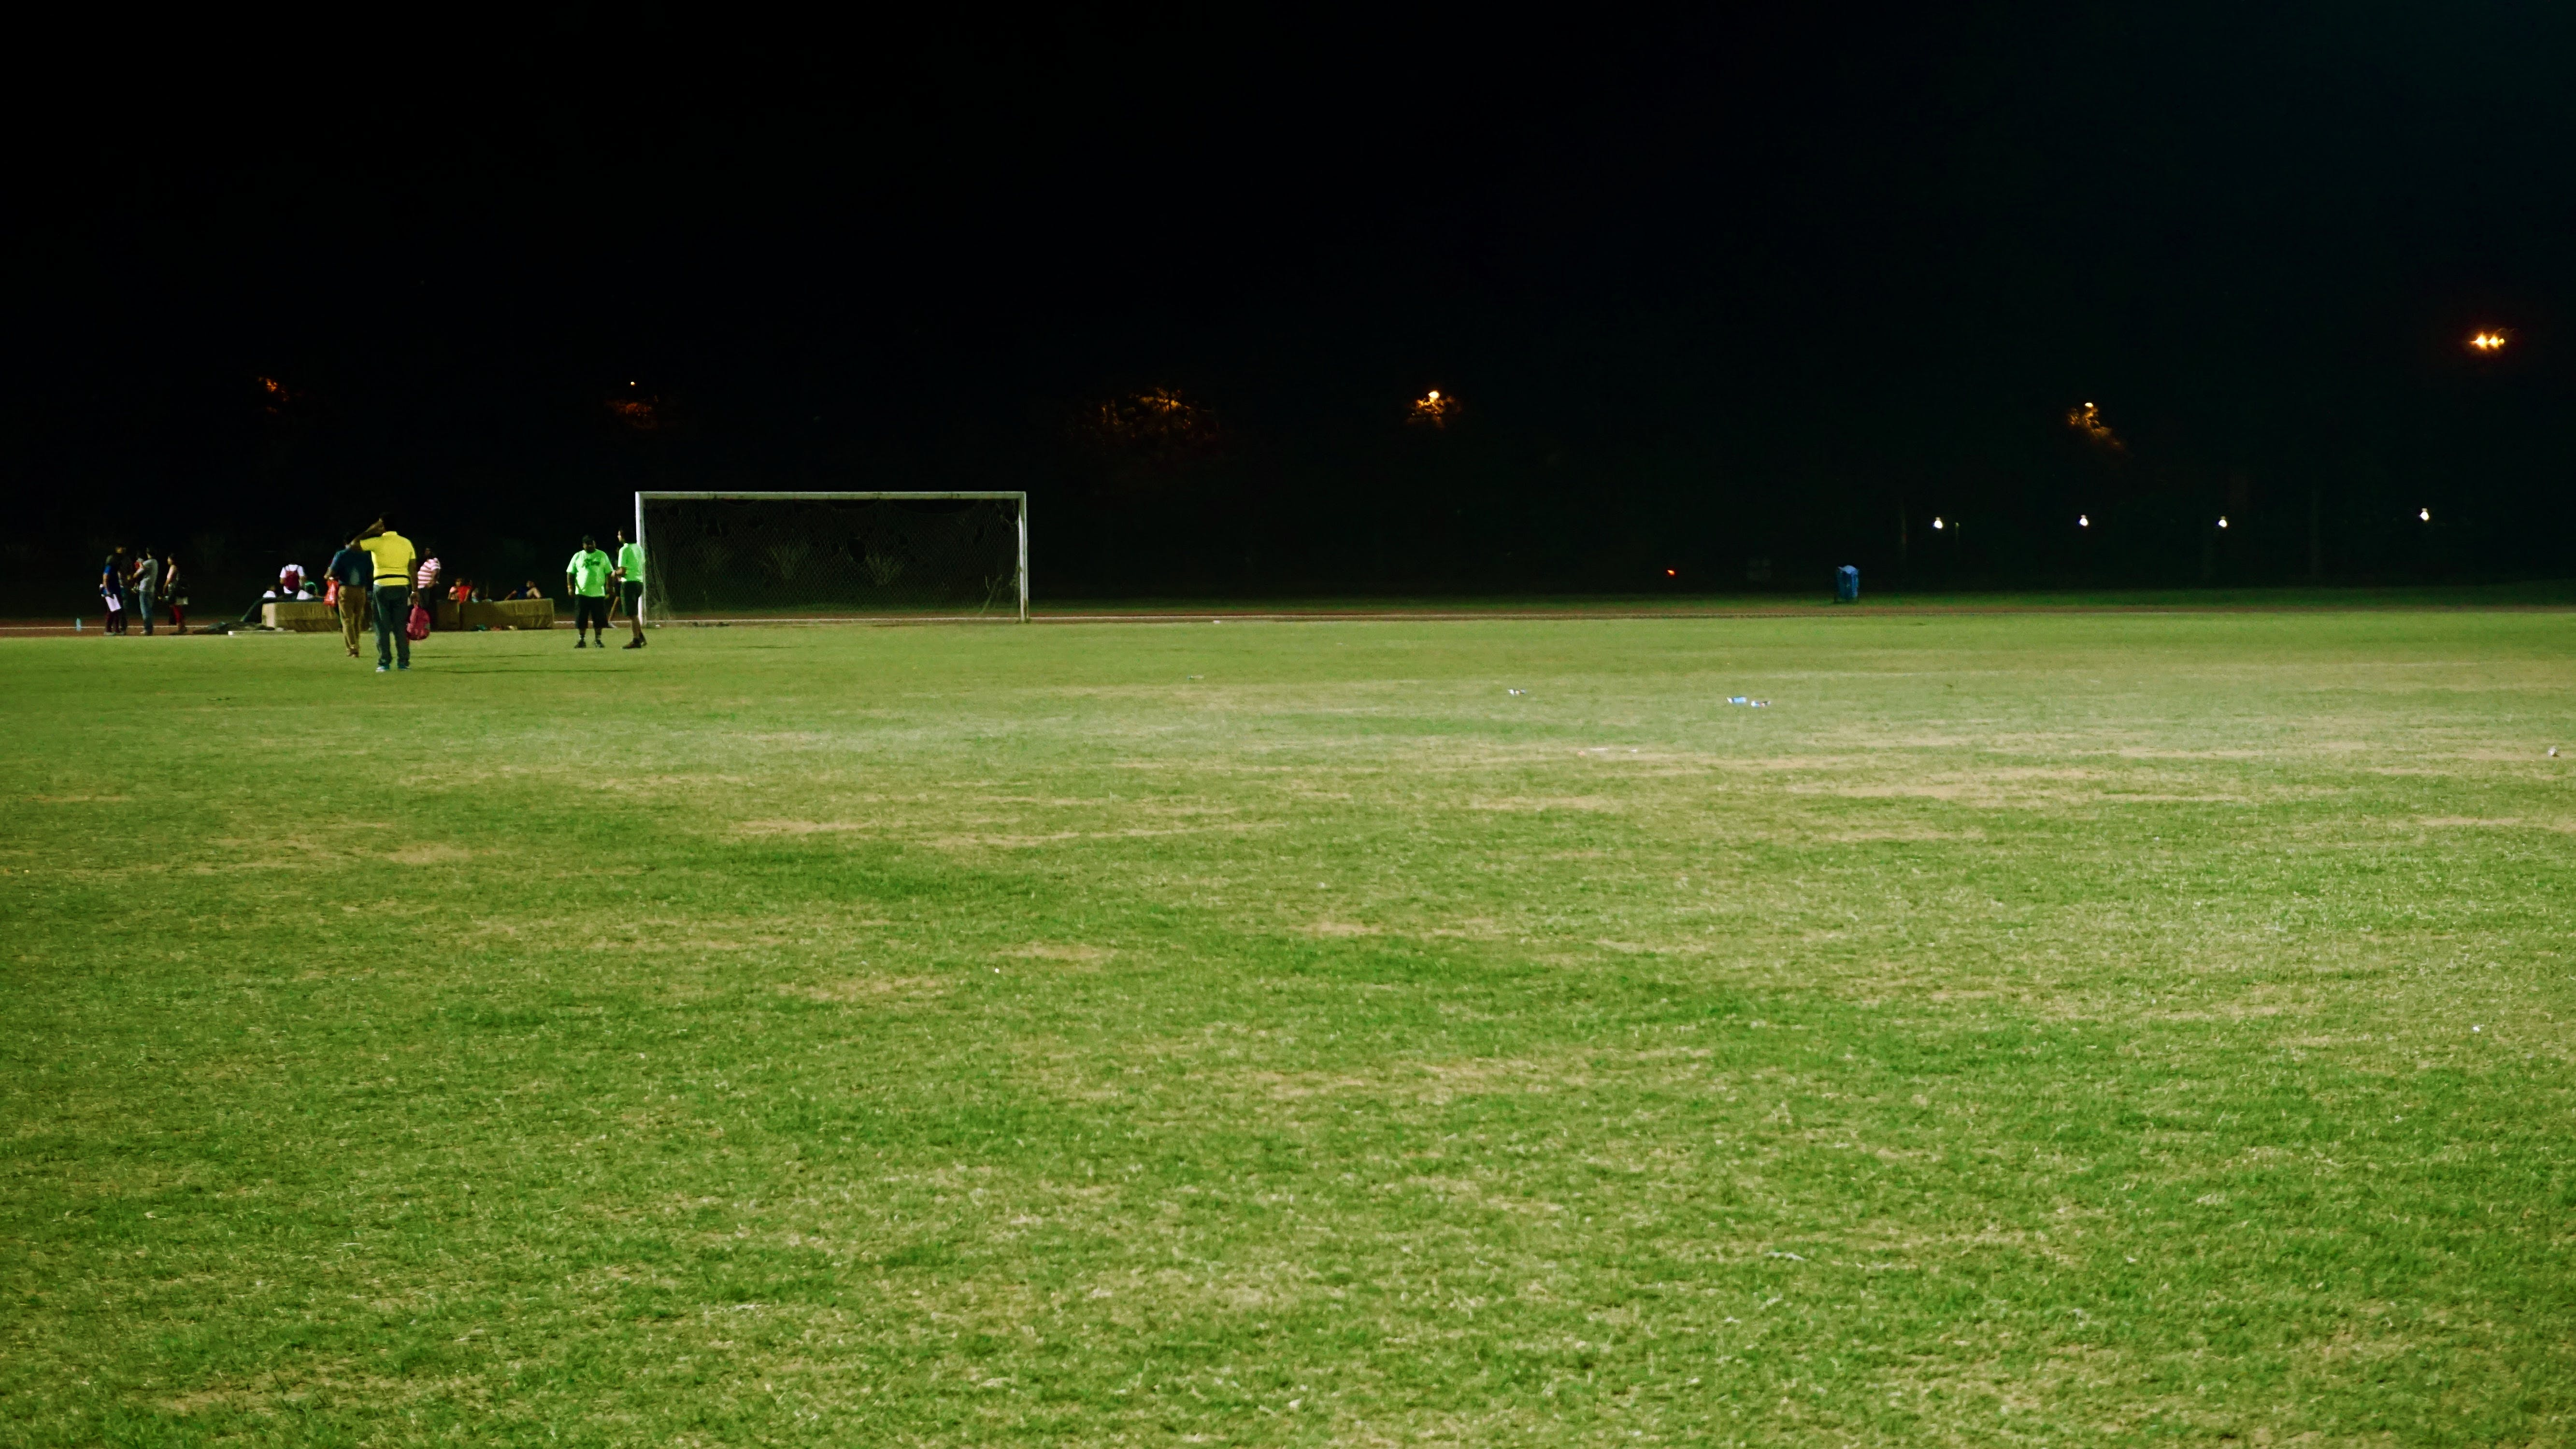 grass field. Free Stock Photo Of People, Lights, Night, Field Grass I